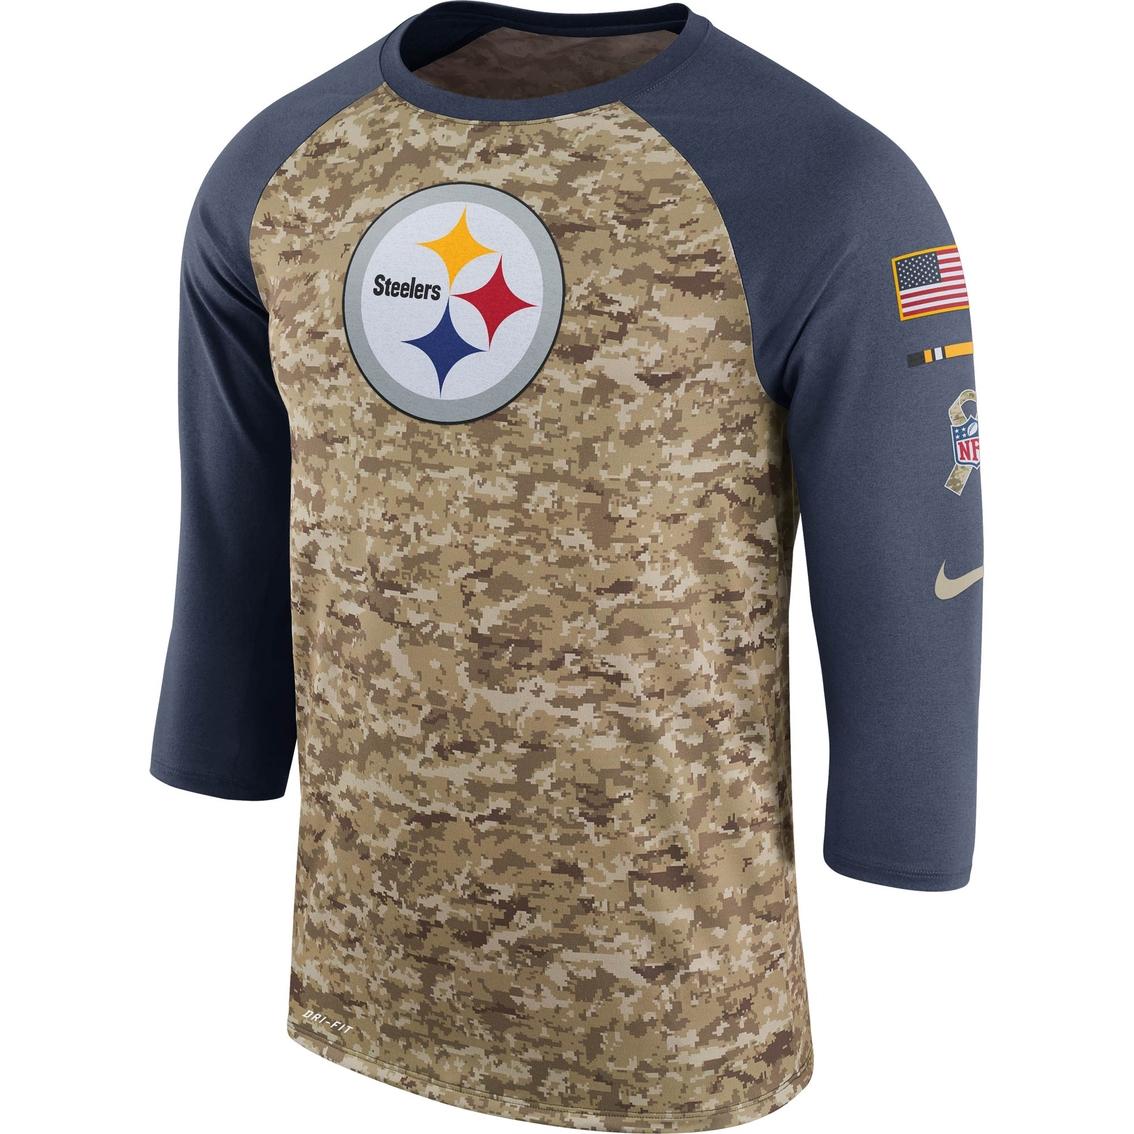 buy online 0a457 7b7de Nike Nfl Pittsburgh Steelers Salute To Service Raglan Tee ...